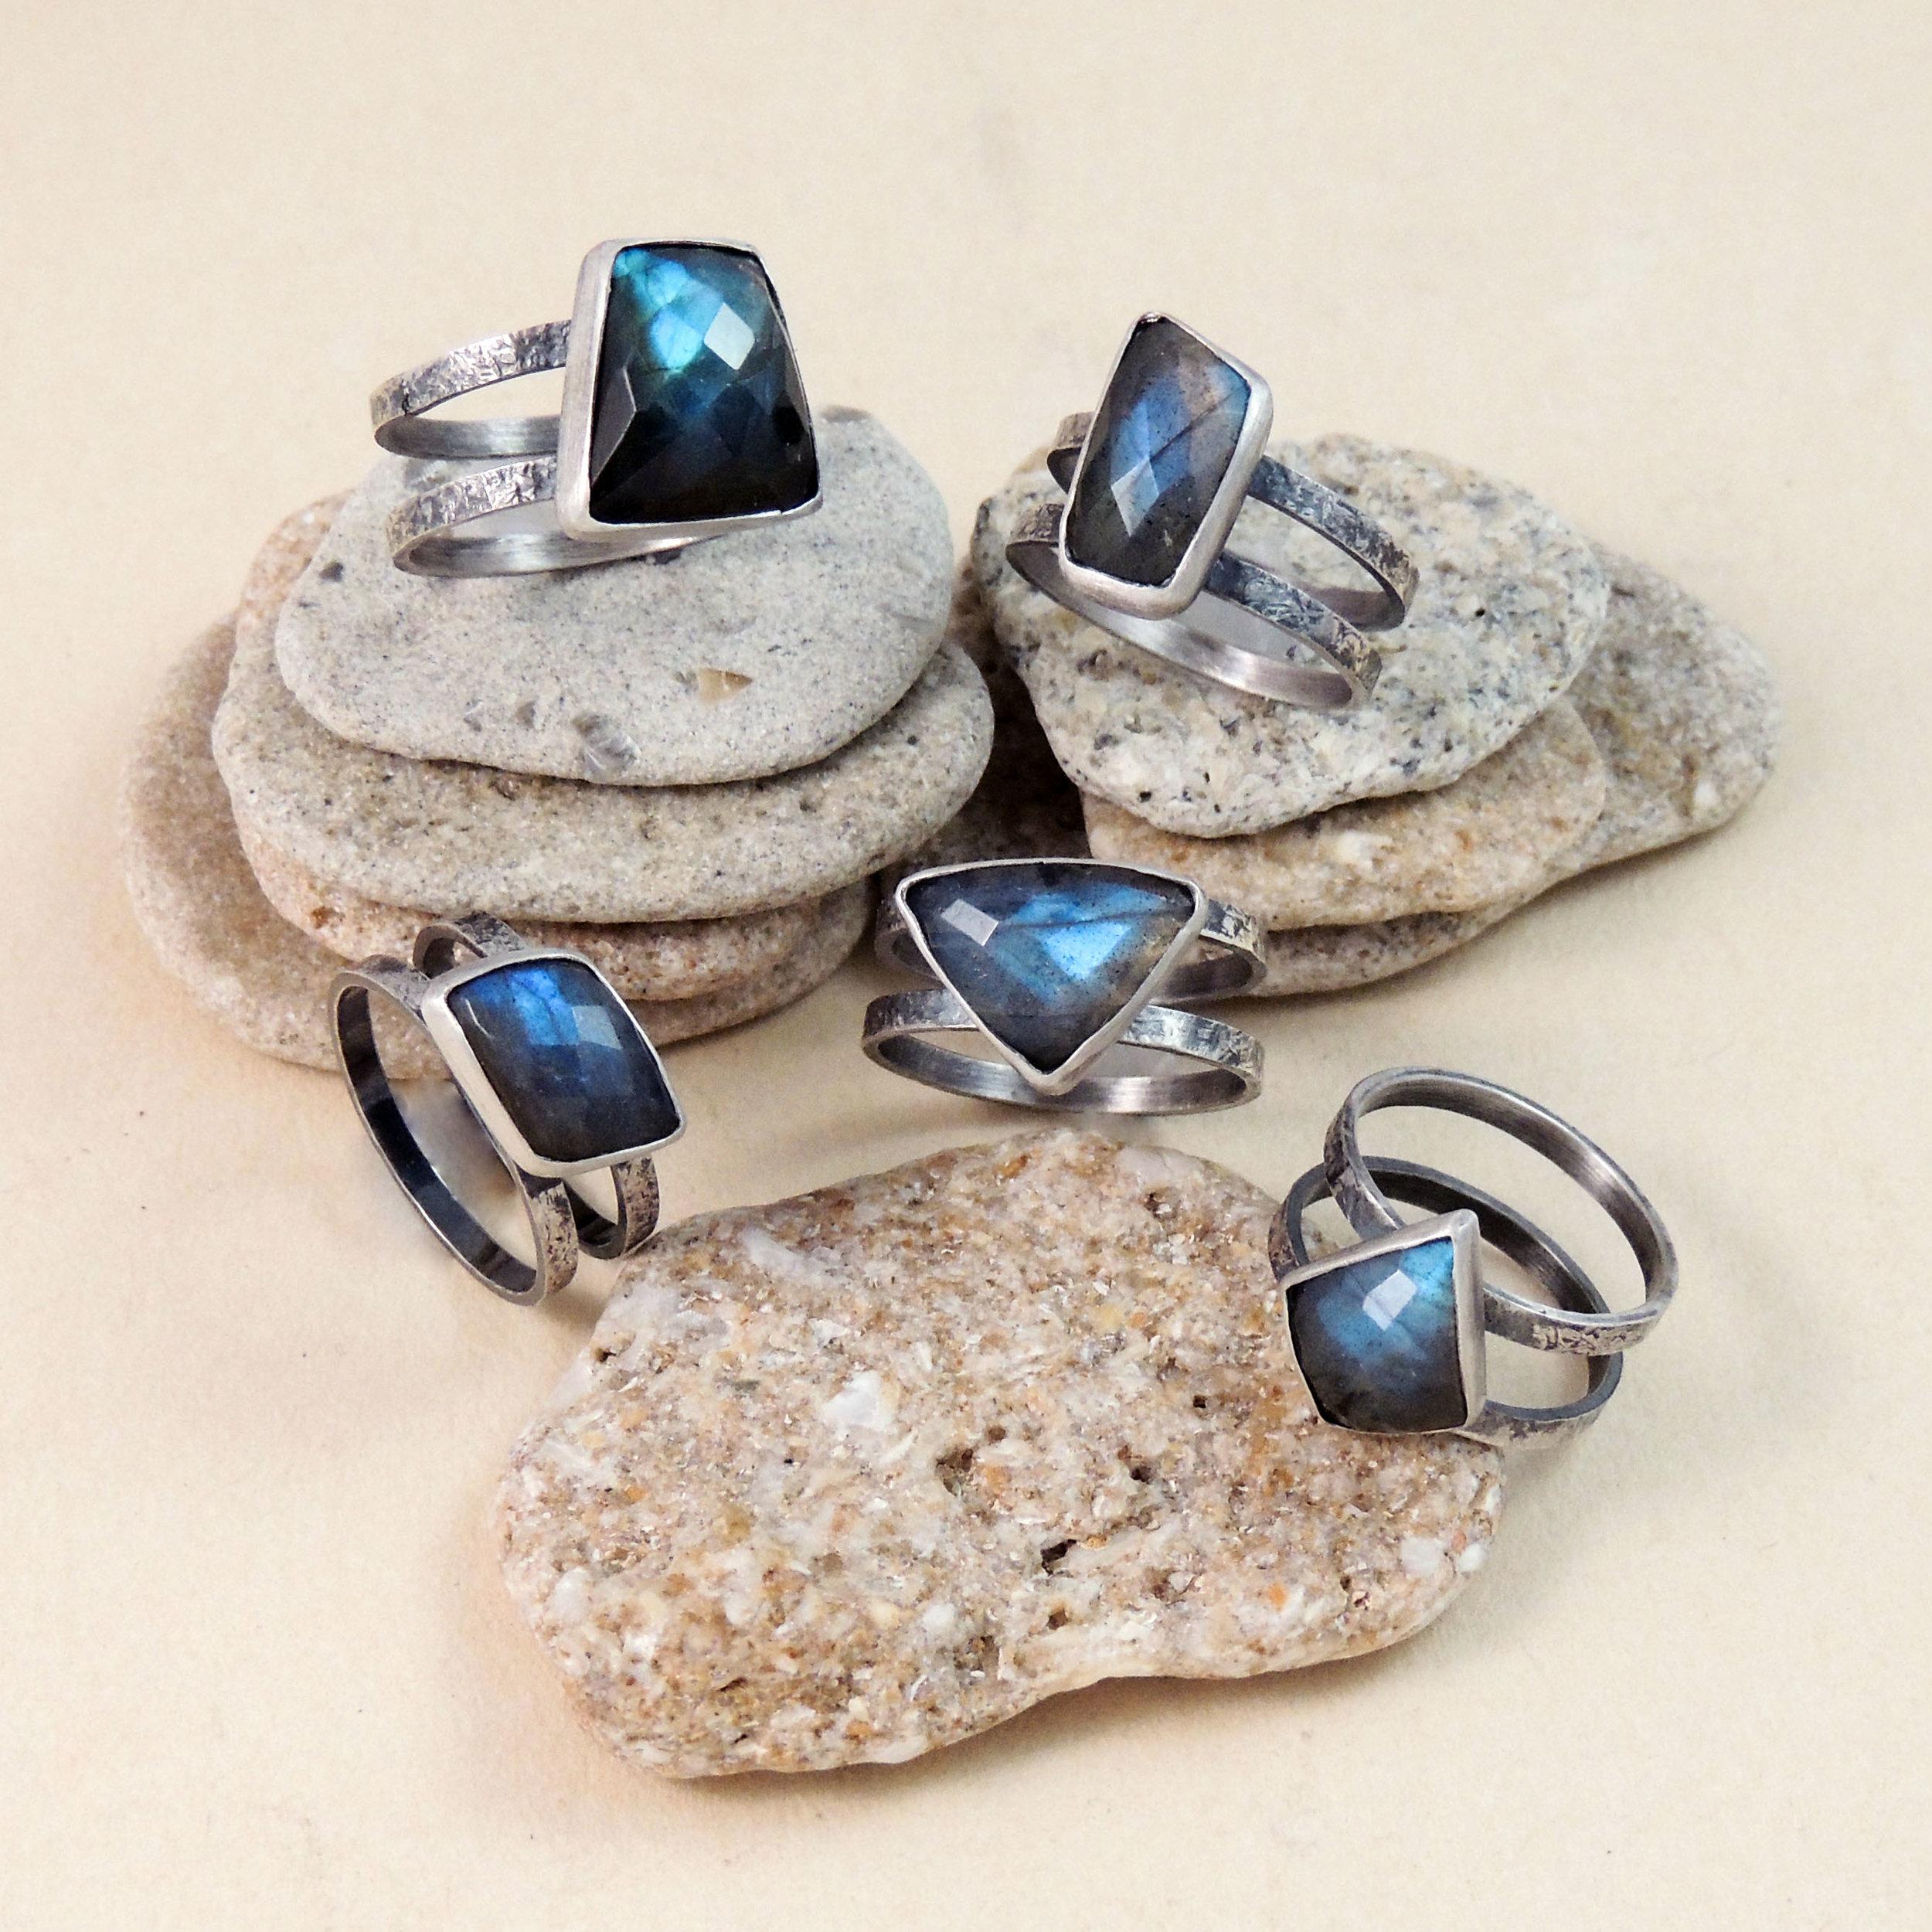 Cosmic Rings- Labradorite & sterling silver- various sizes $99.00